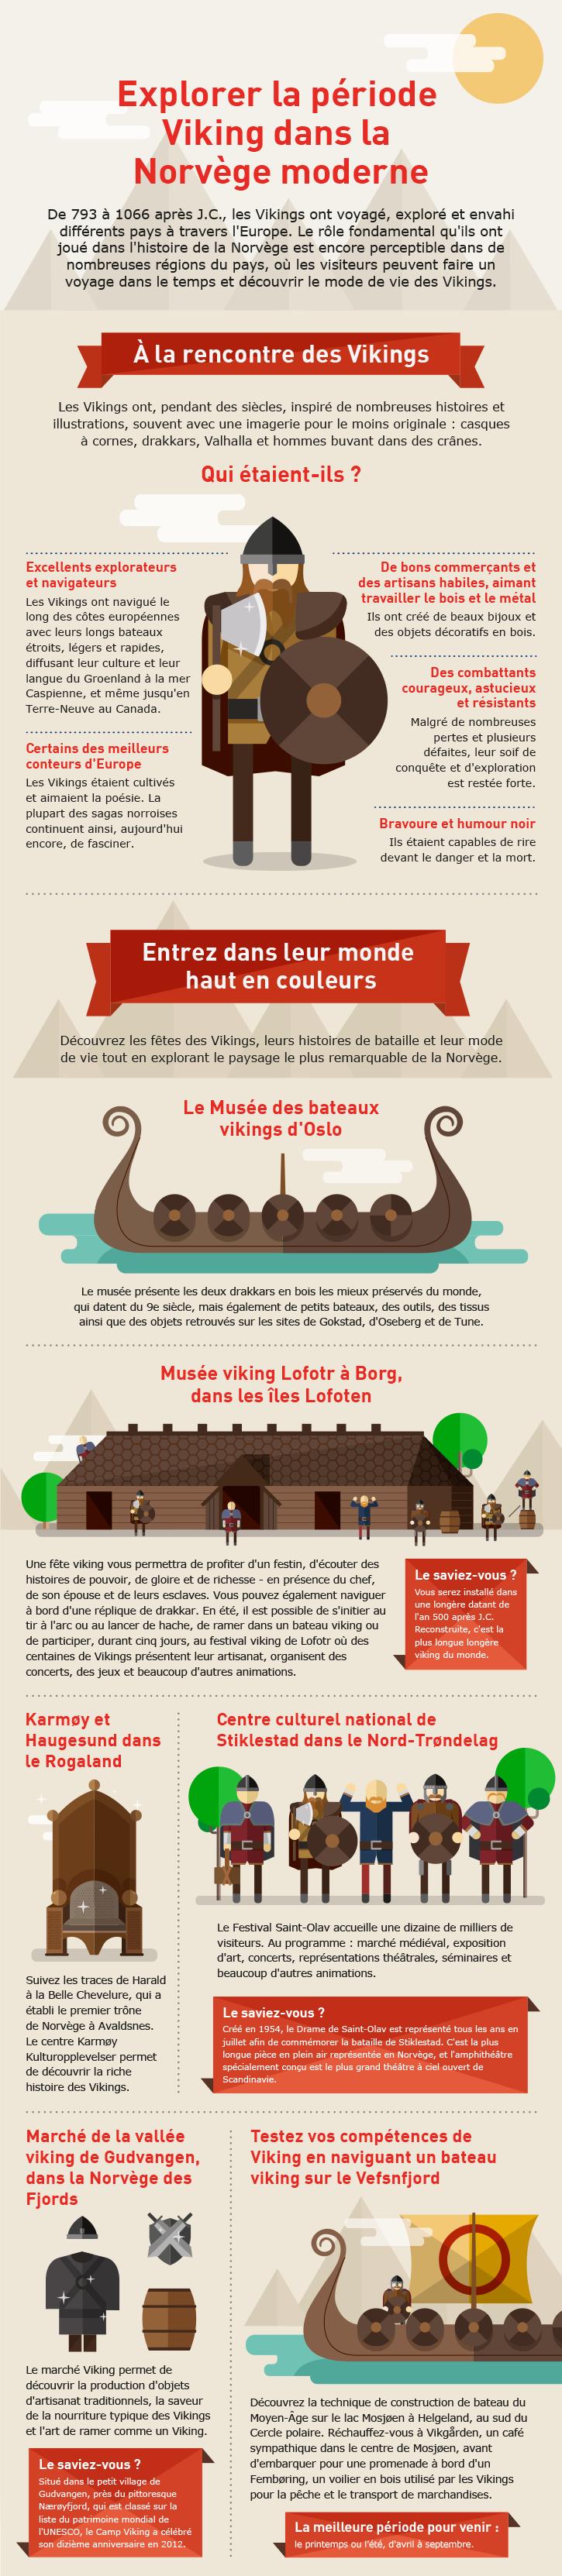 Infographie Vikings Norvege